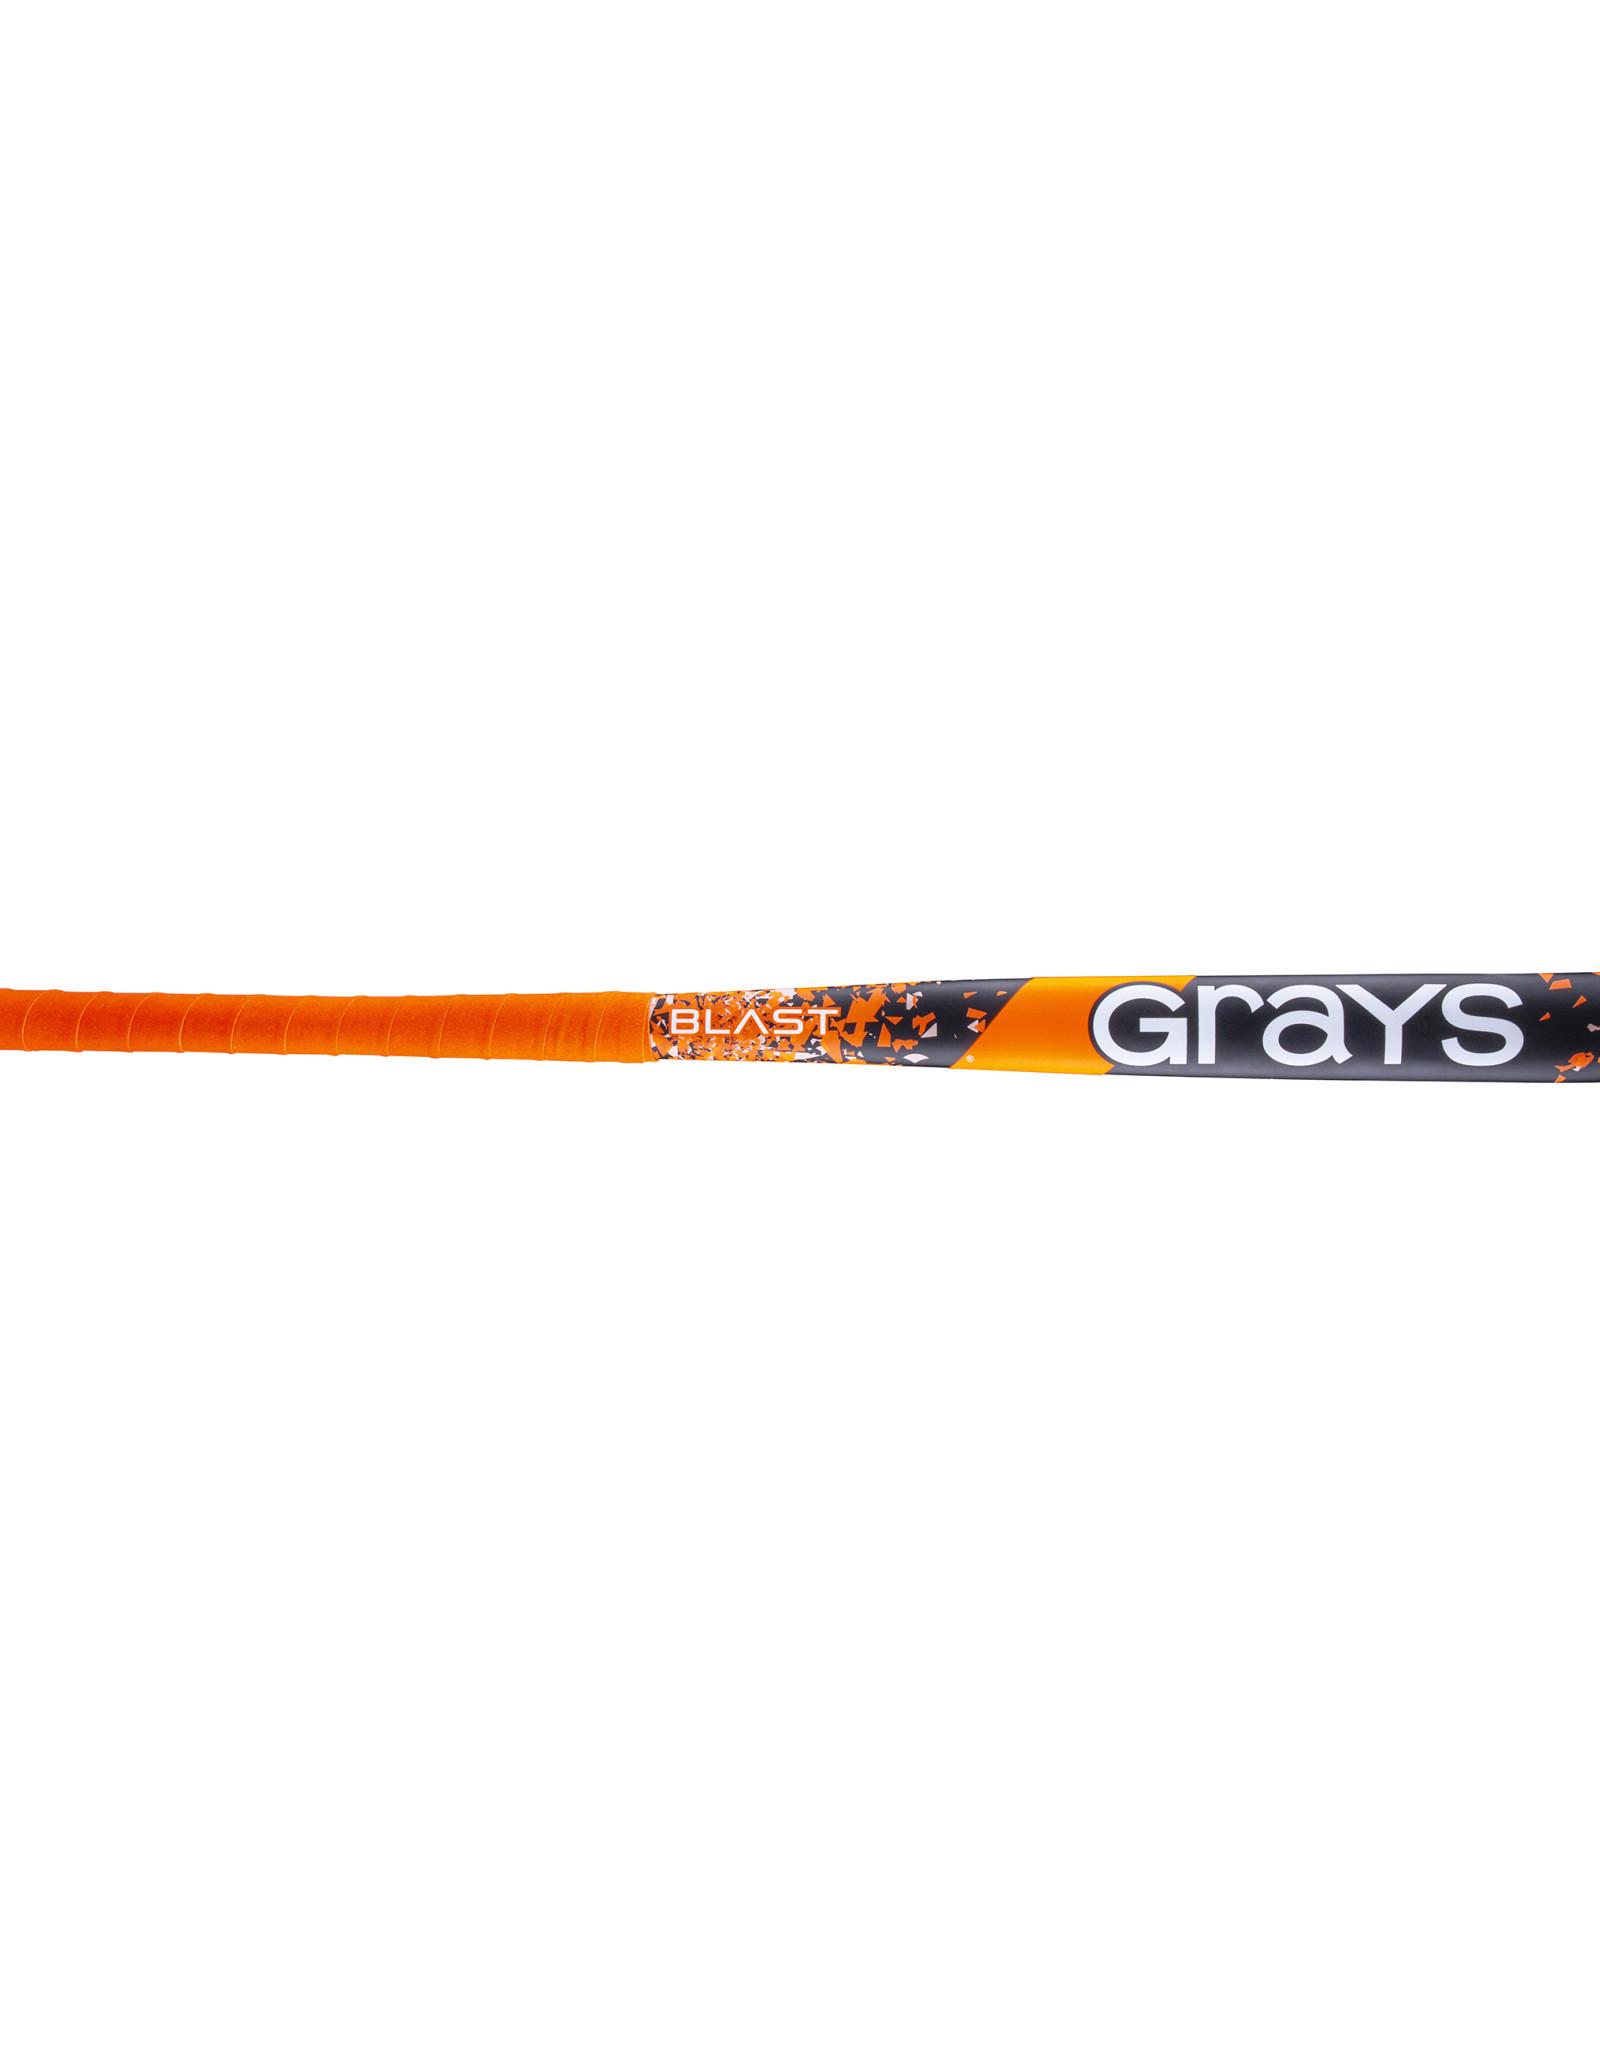 Grays STK BLAST UB MC